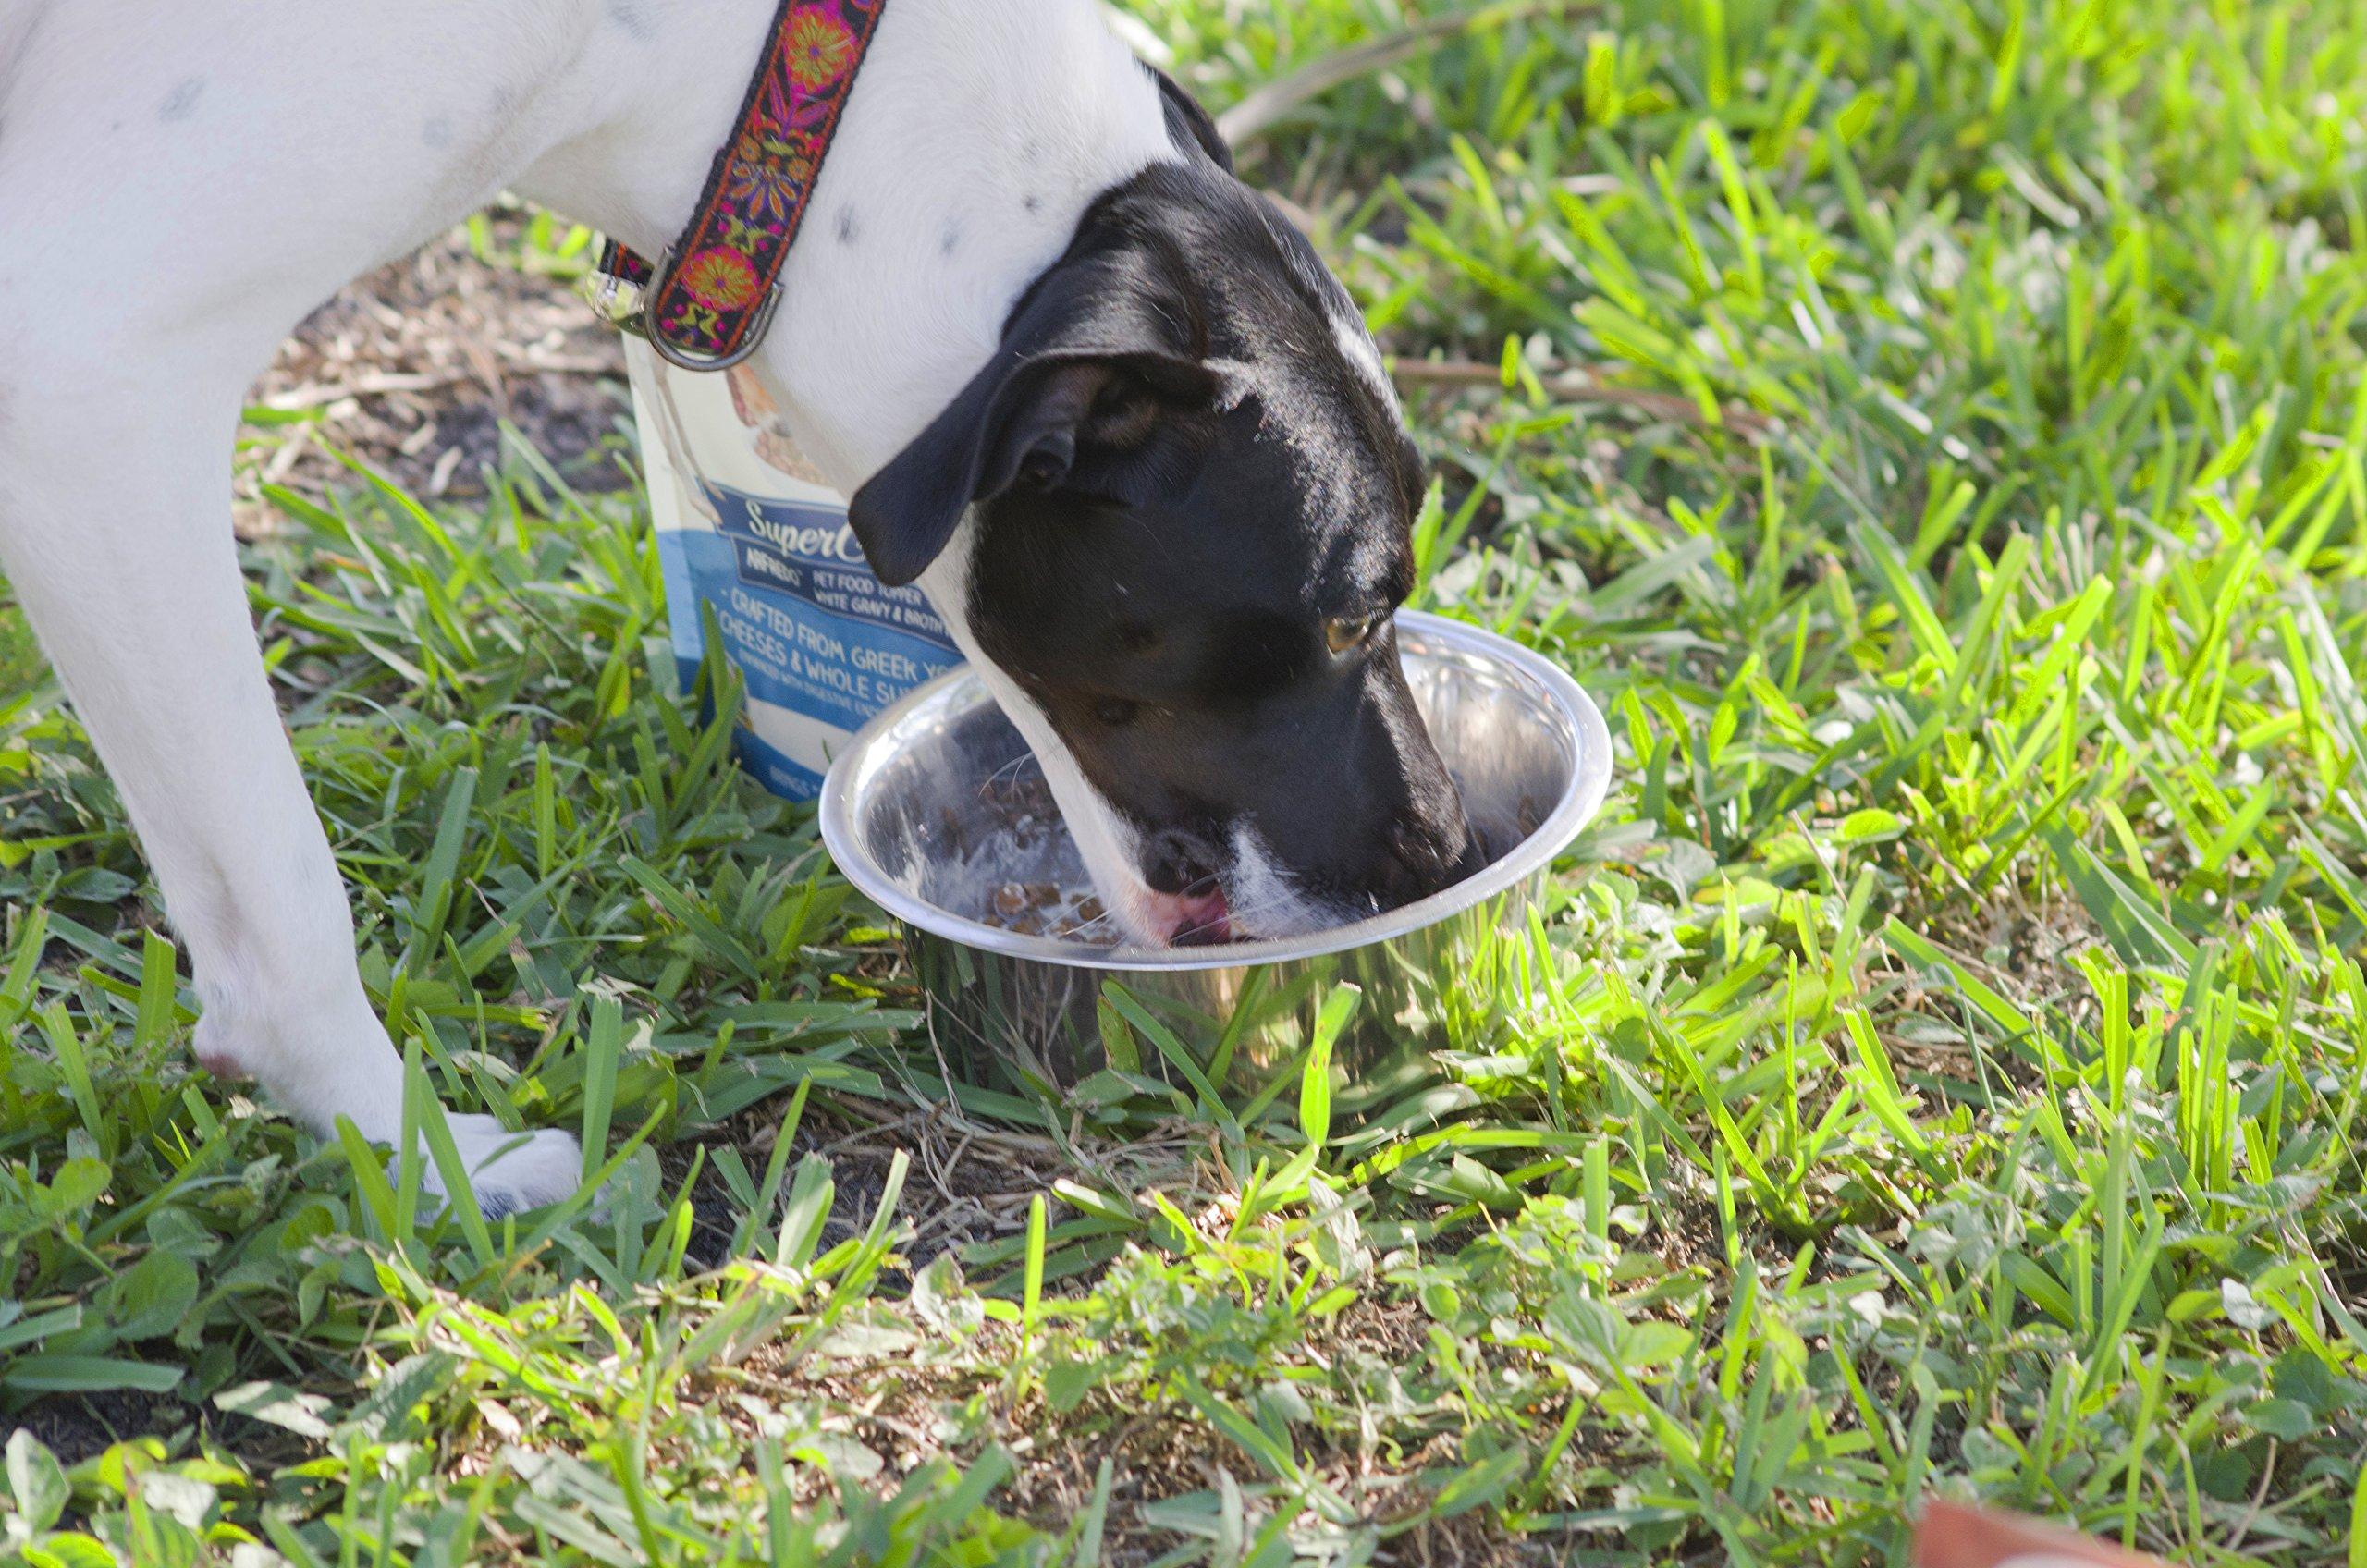 SuperGravy Bundle - Natural Dog Food Gravy Topper - Hydration Broth Food Mix - Human Grade – Kibble Seasoning for Picky Eaters – Gluten Free & Grain Free 6